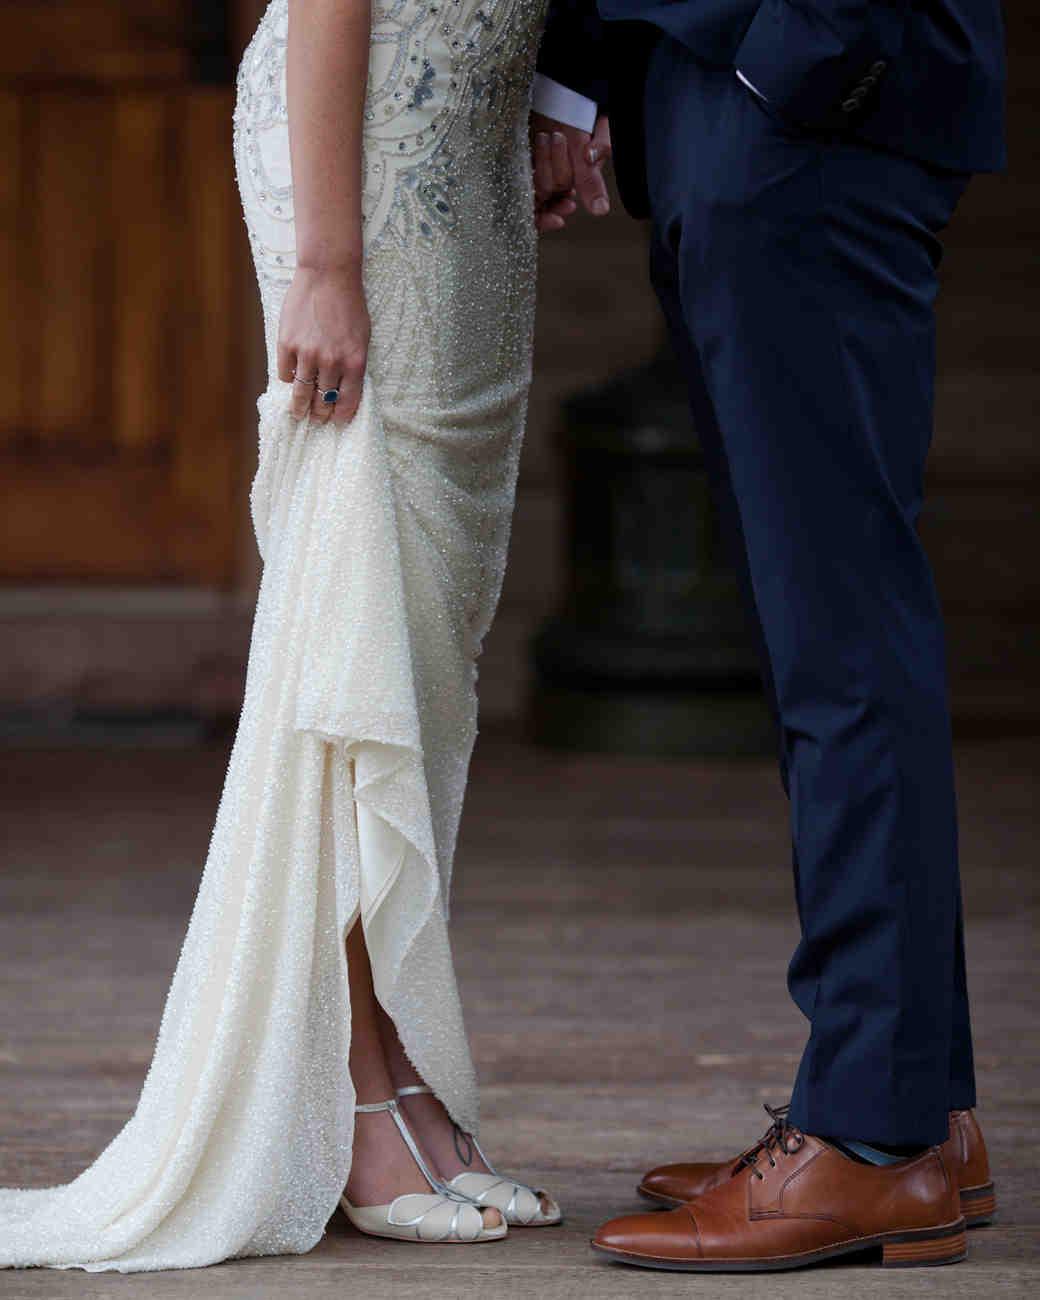 lizzy-pat-wedding-shoes-040-s111777-0115.jpg